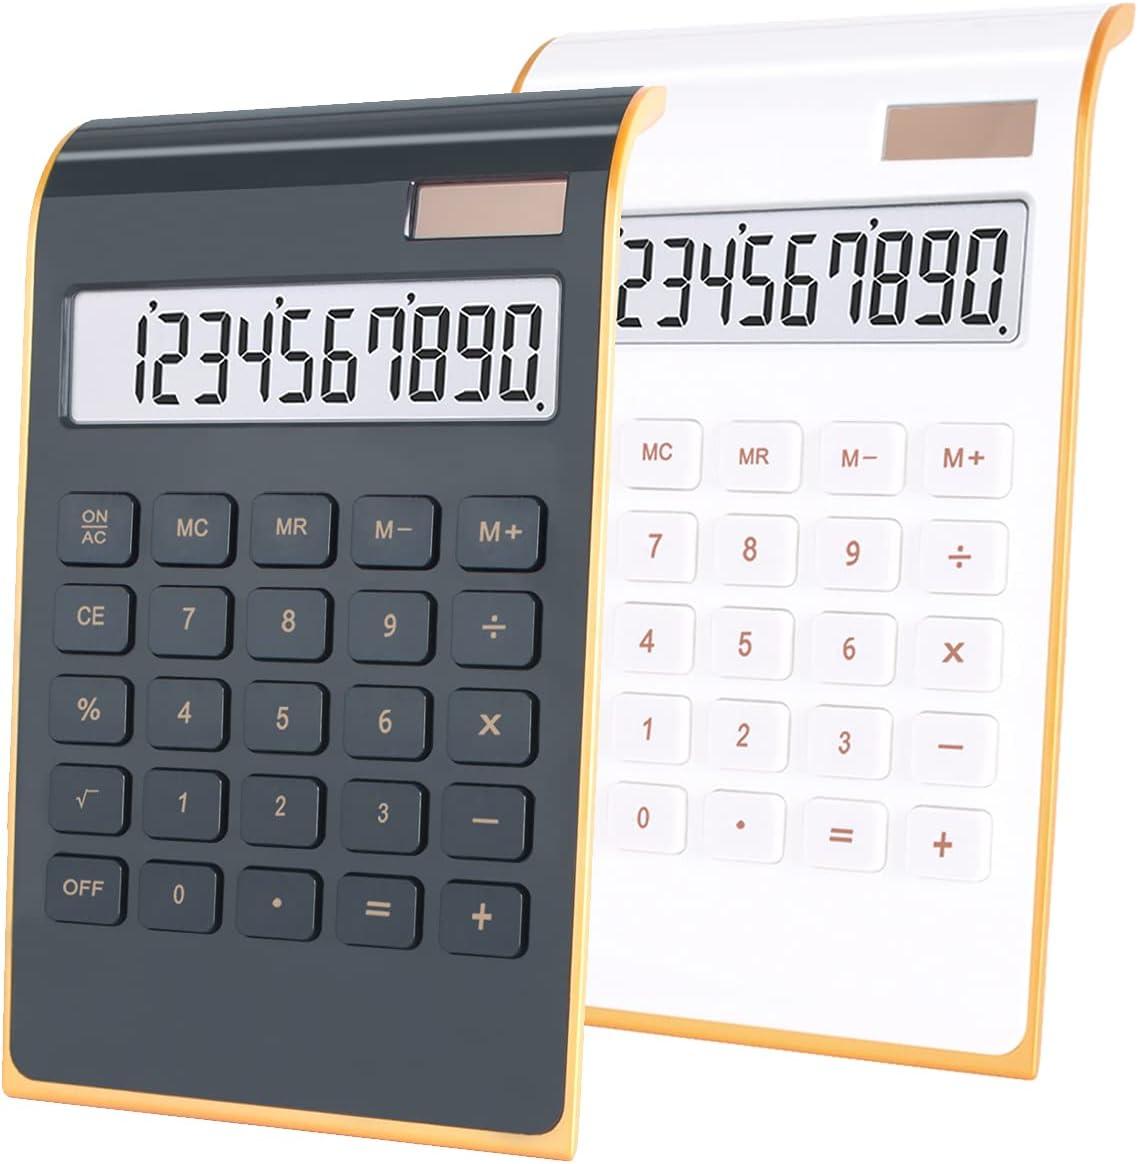 Desktop Calculator BESTWYA Cheap SALE Start 10-Digit Handheld 67% OFF of fixed price Dual Power